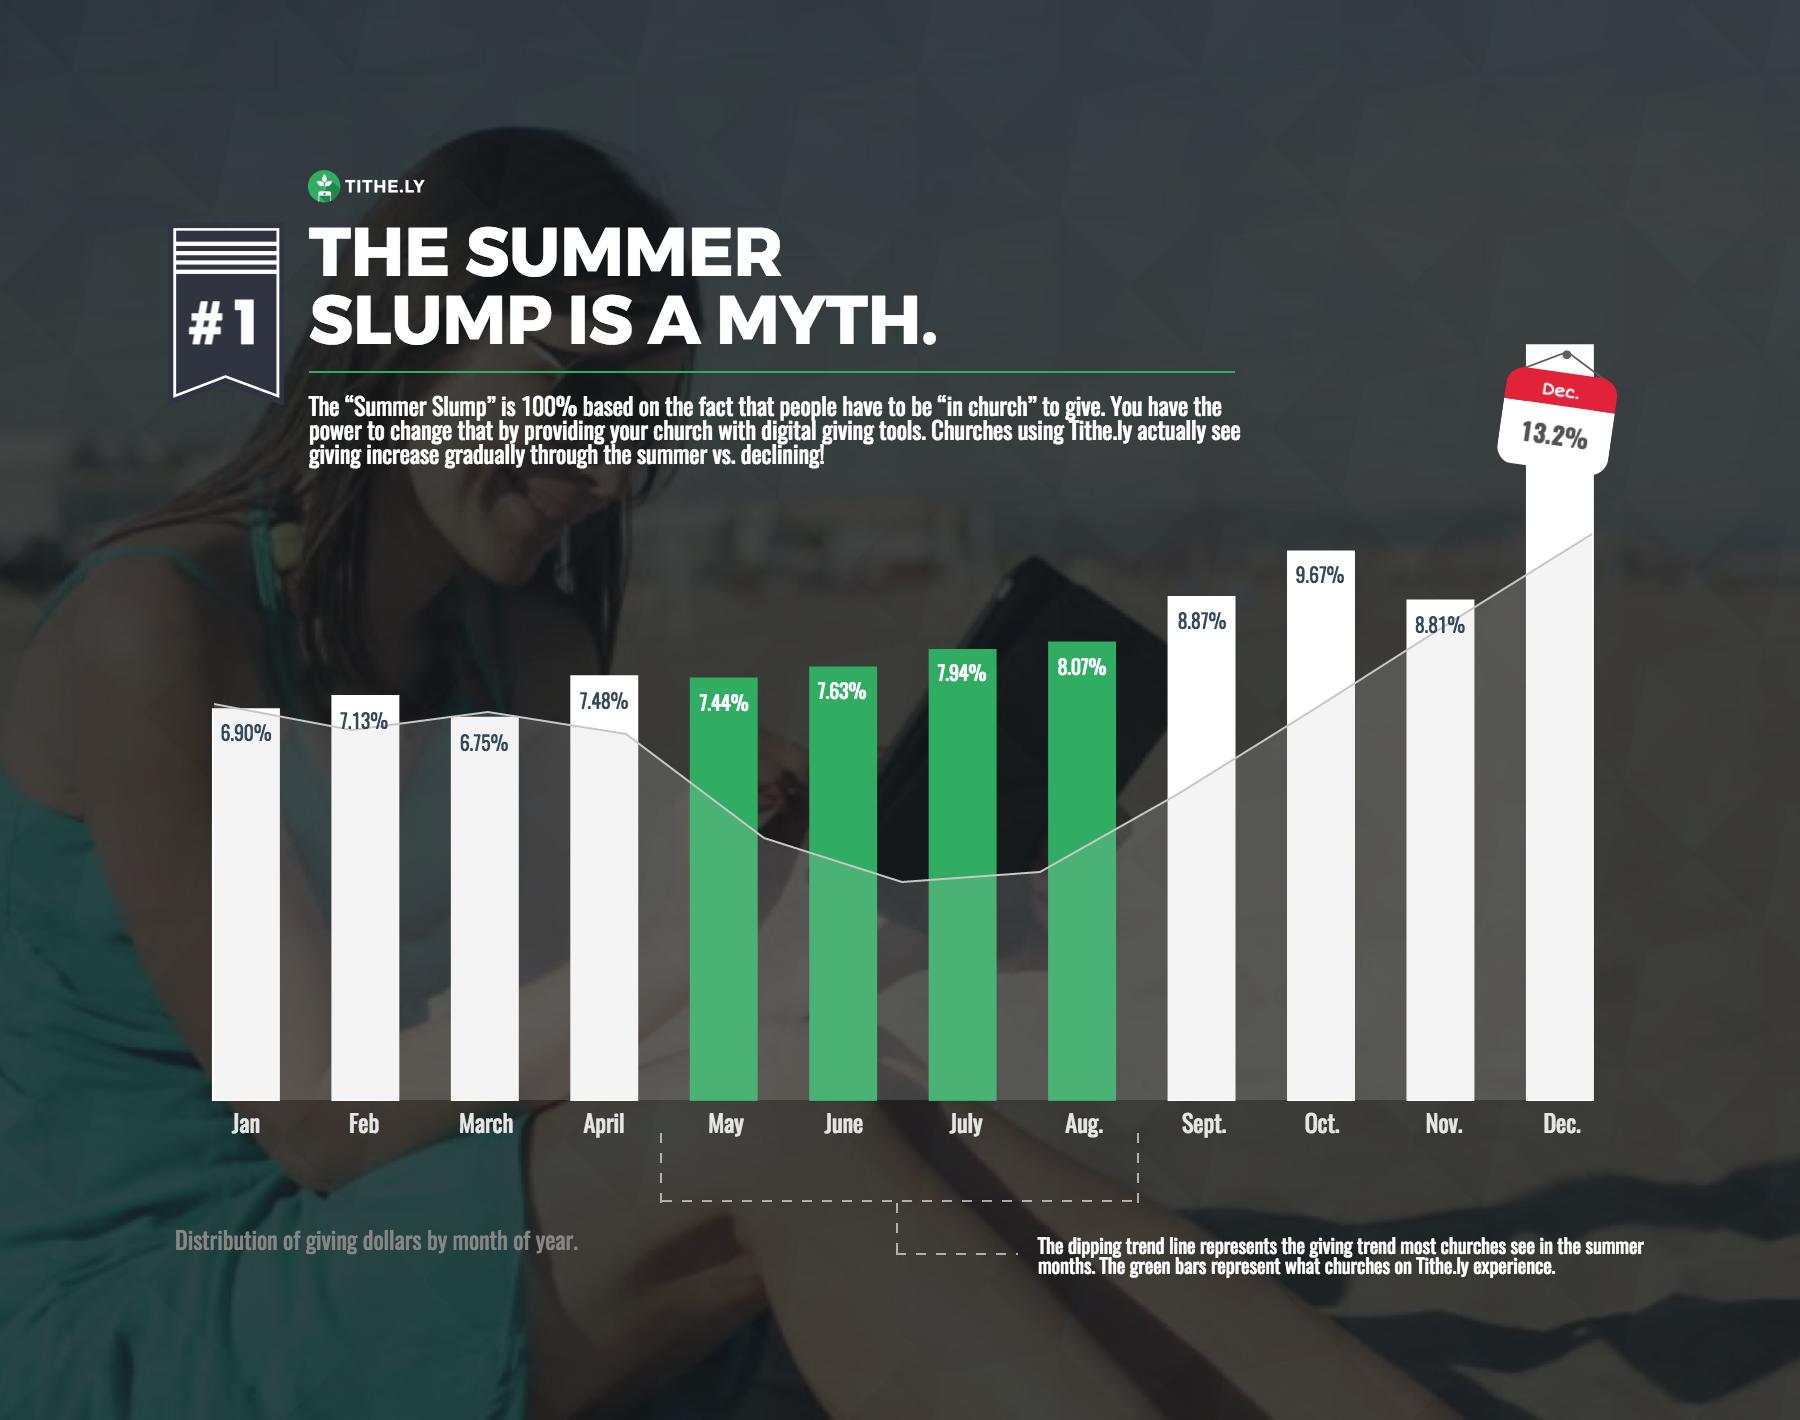 The Summer Slump is a Myth